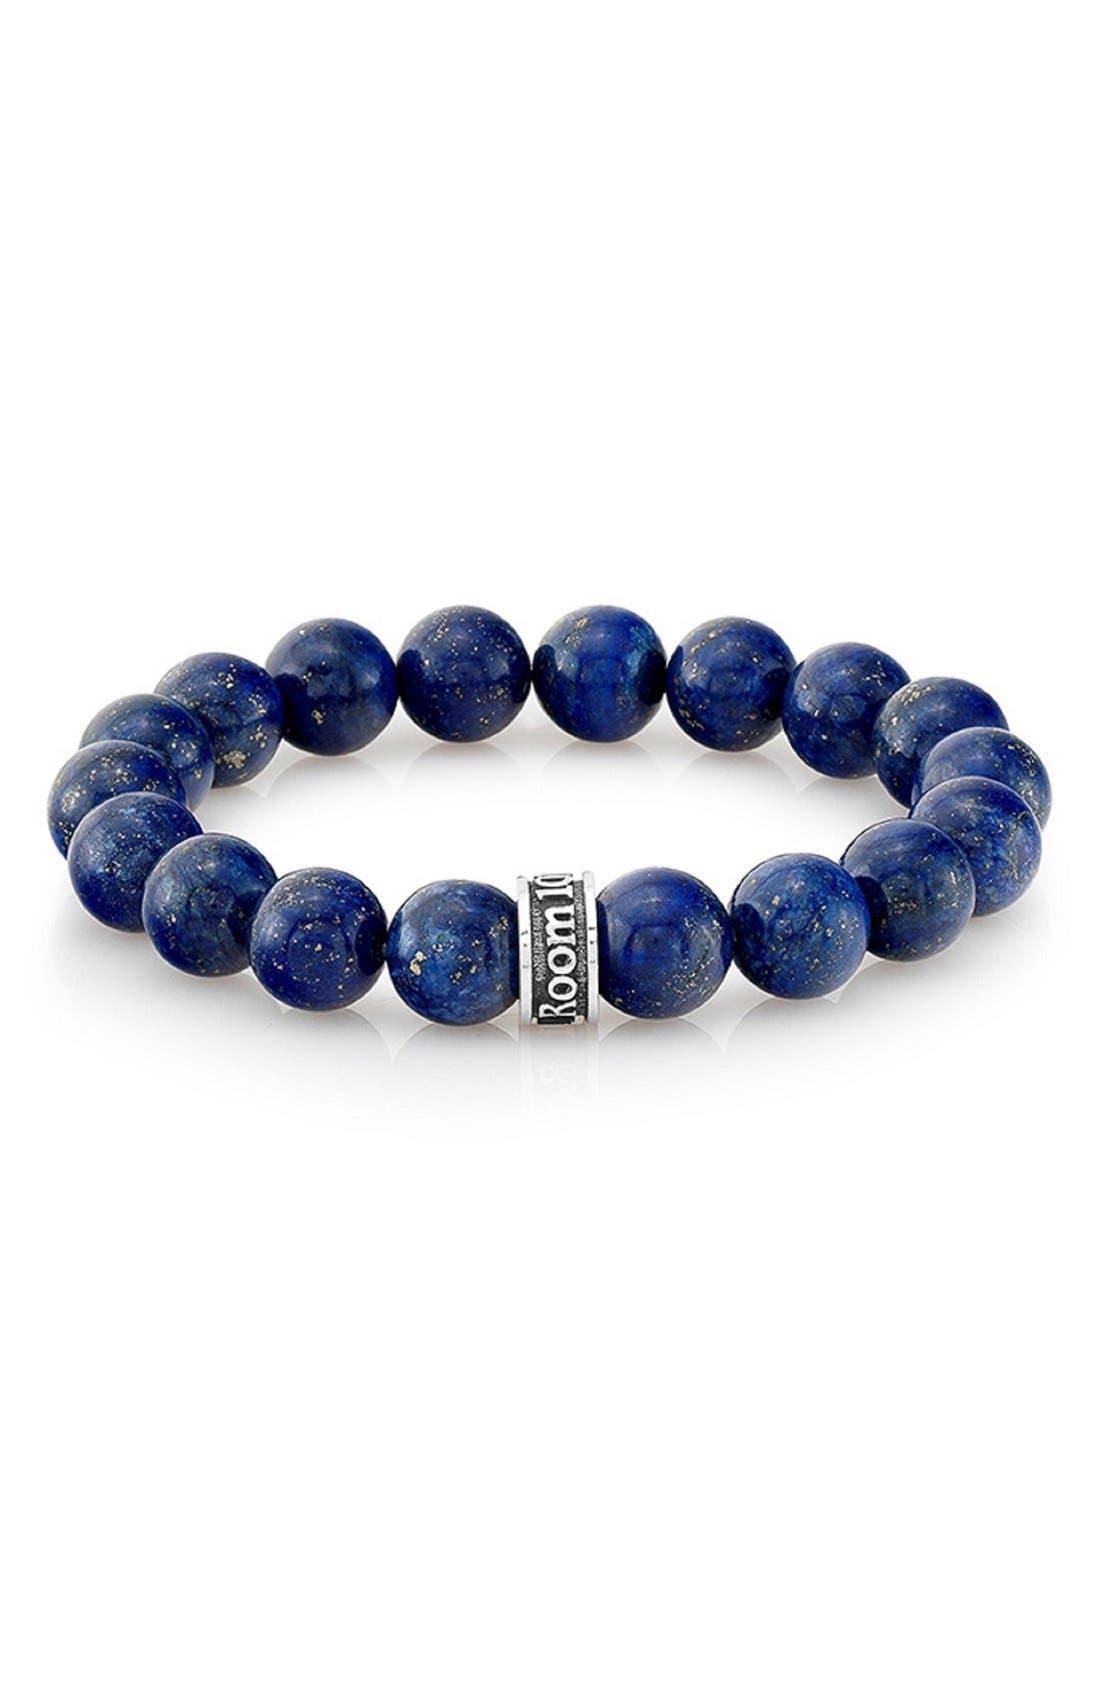 Room101 Lapis Lazuli Bead Bracelet